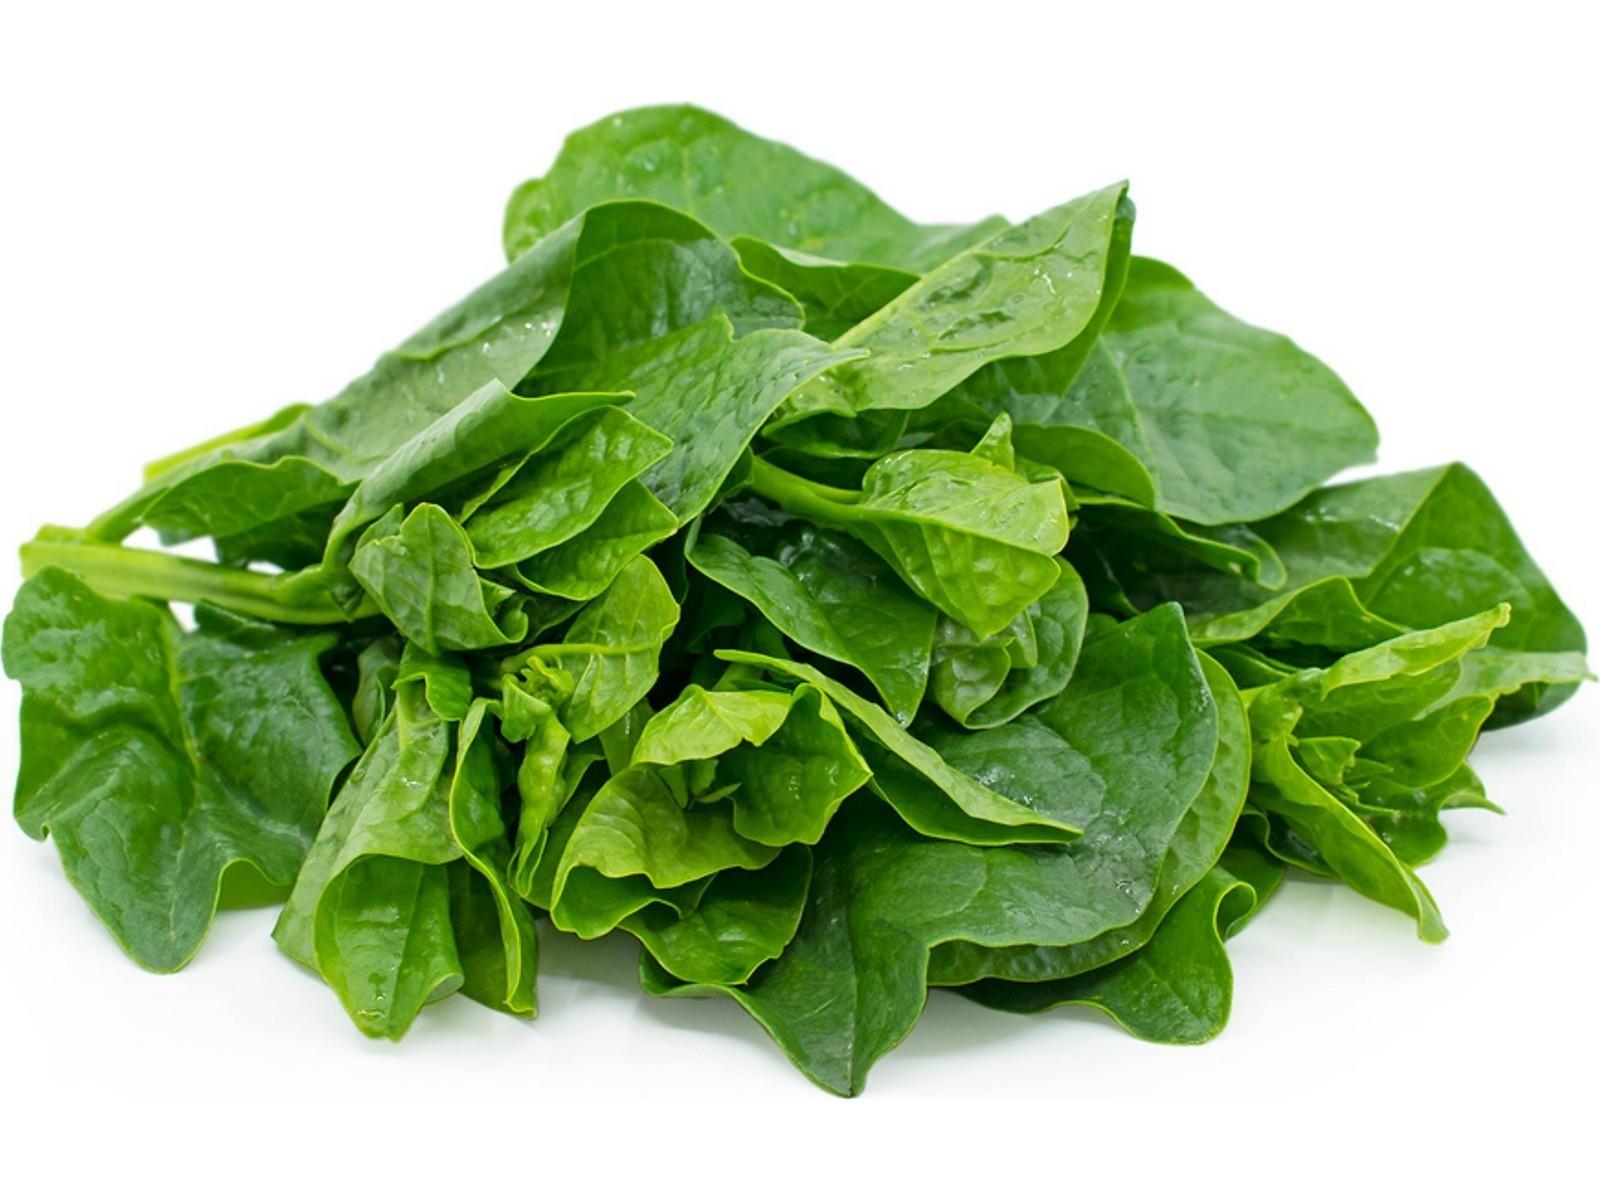 BMS Organics-Ceylon Spinach (200g) *(Outstation N/A; 外州送不到)